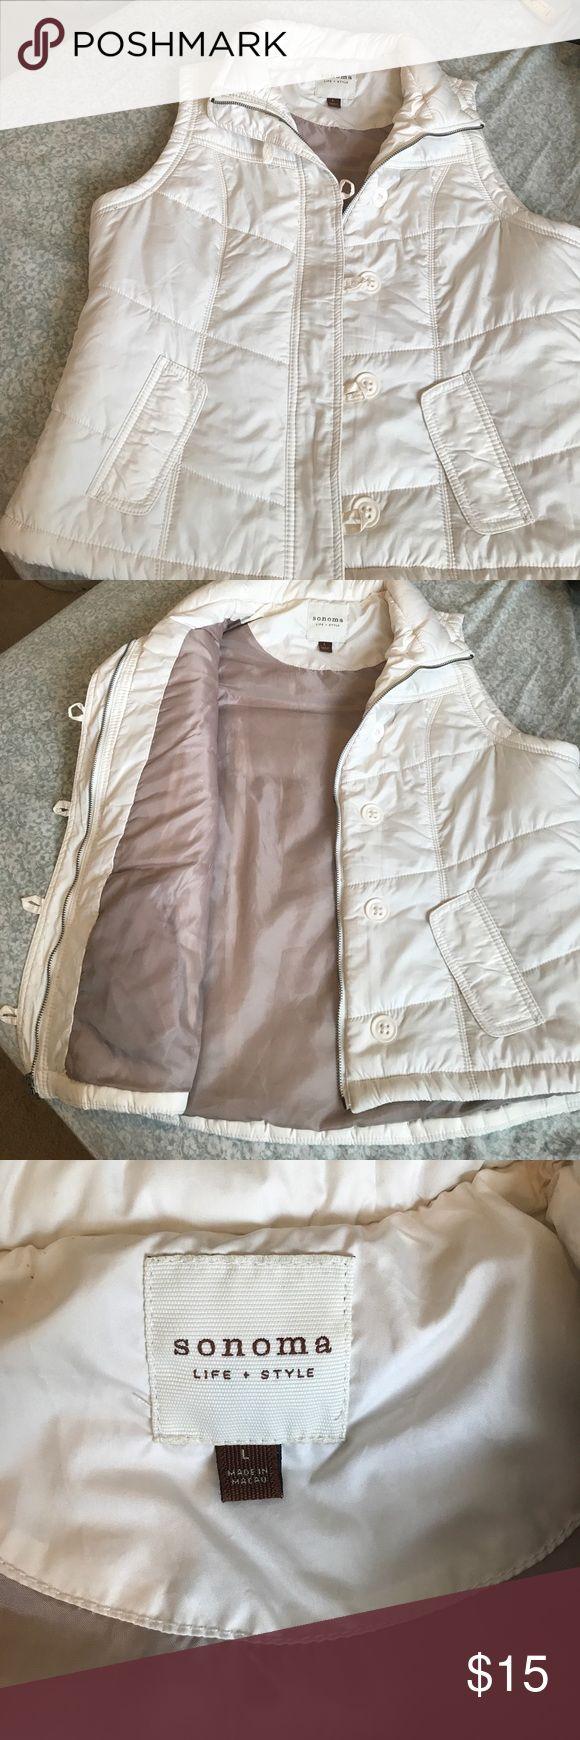 Cream vest gently used Sonoma cream vest size large Sonoma Jackets & Coats Vests